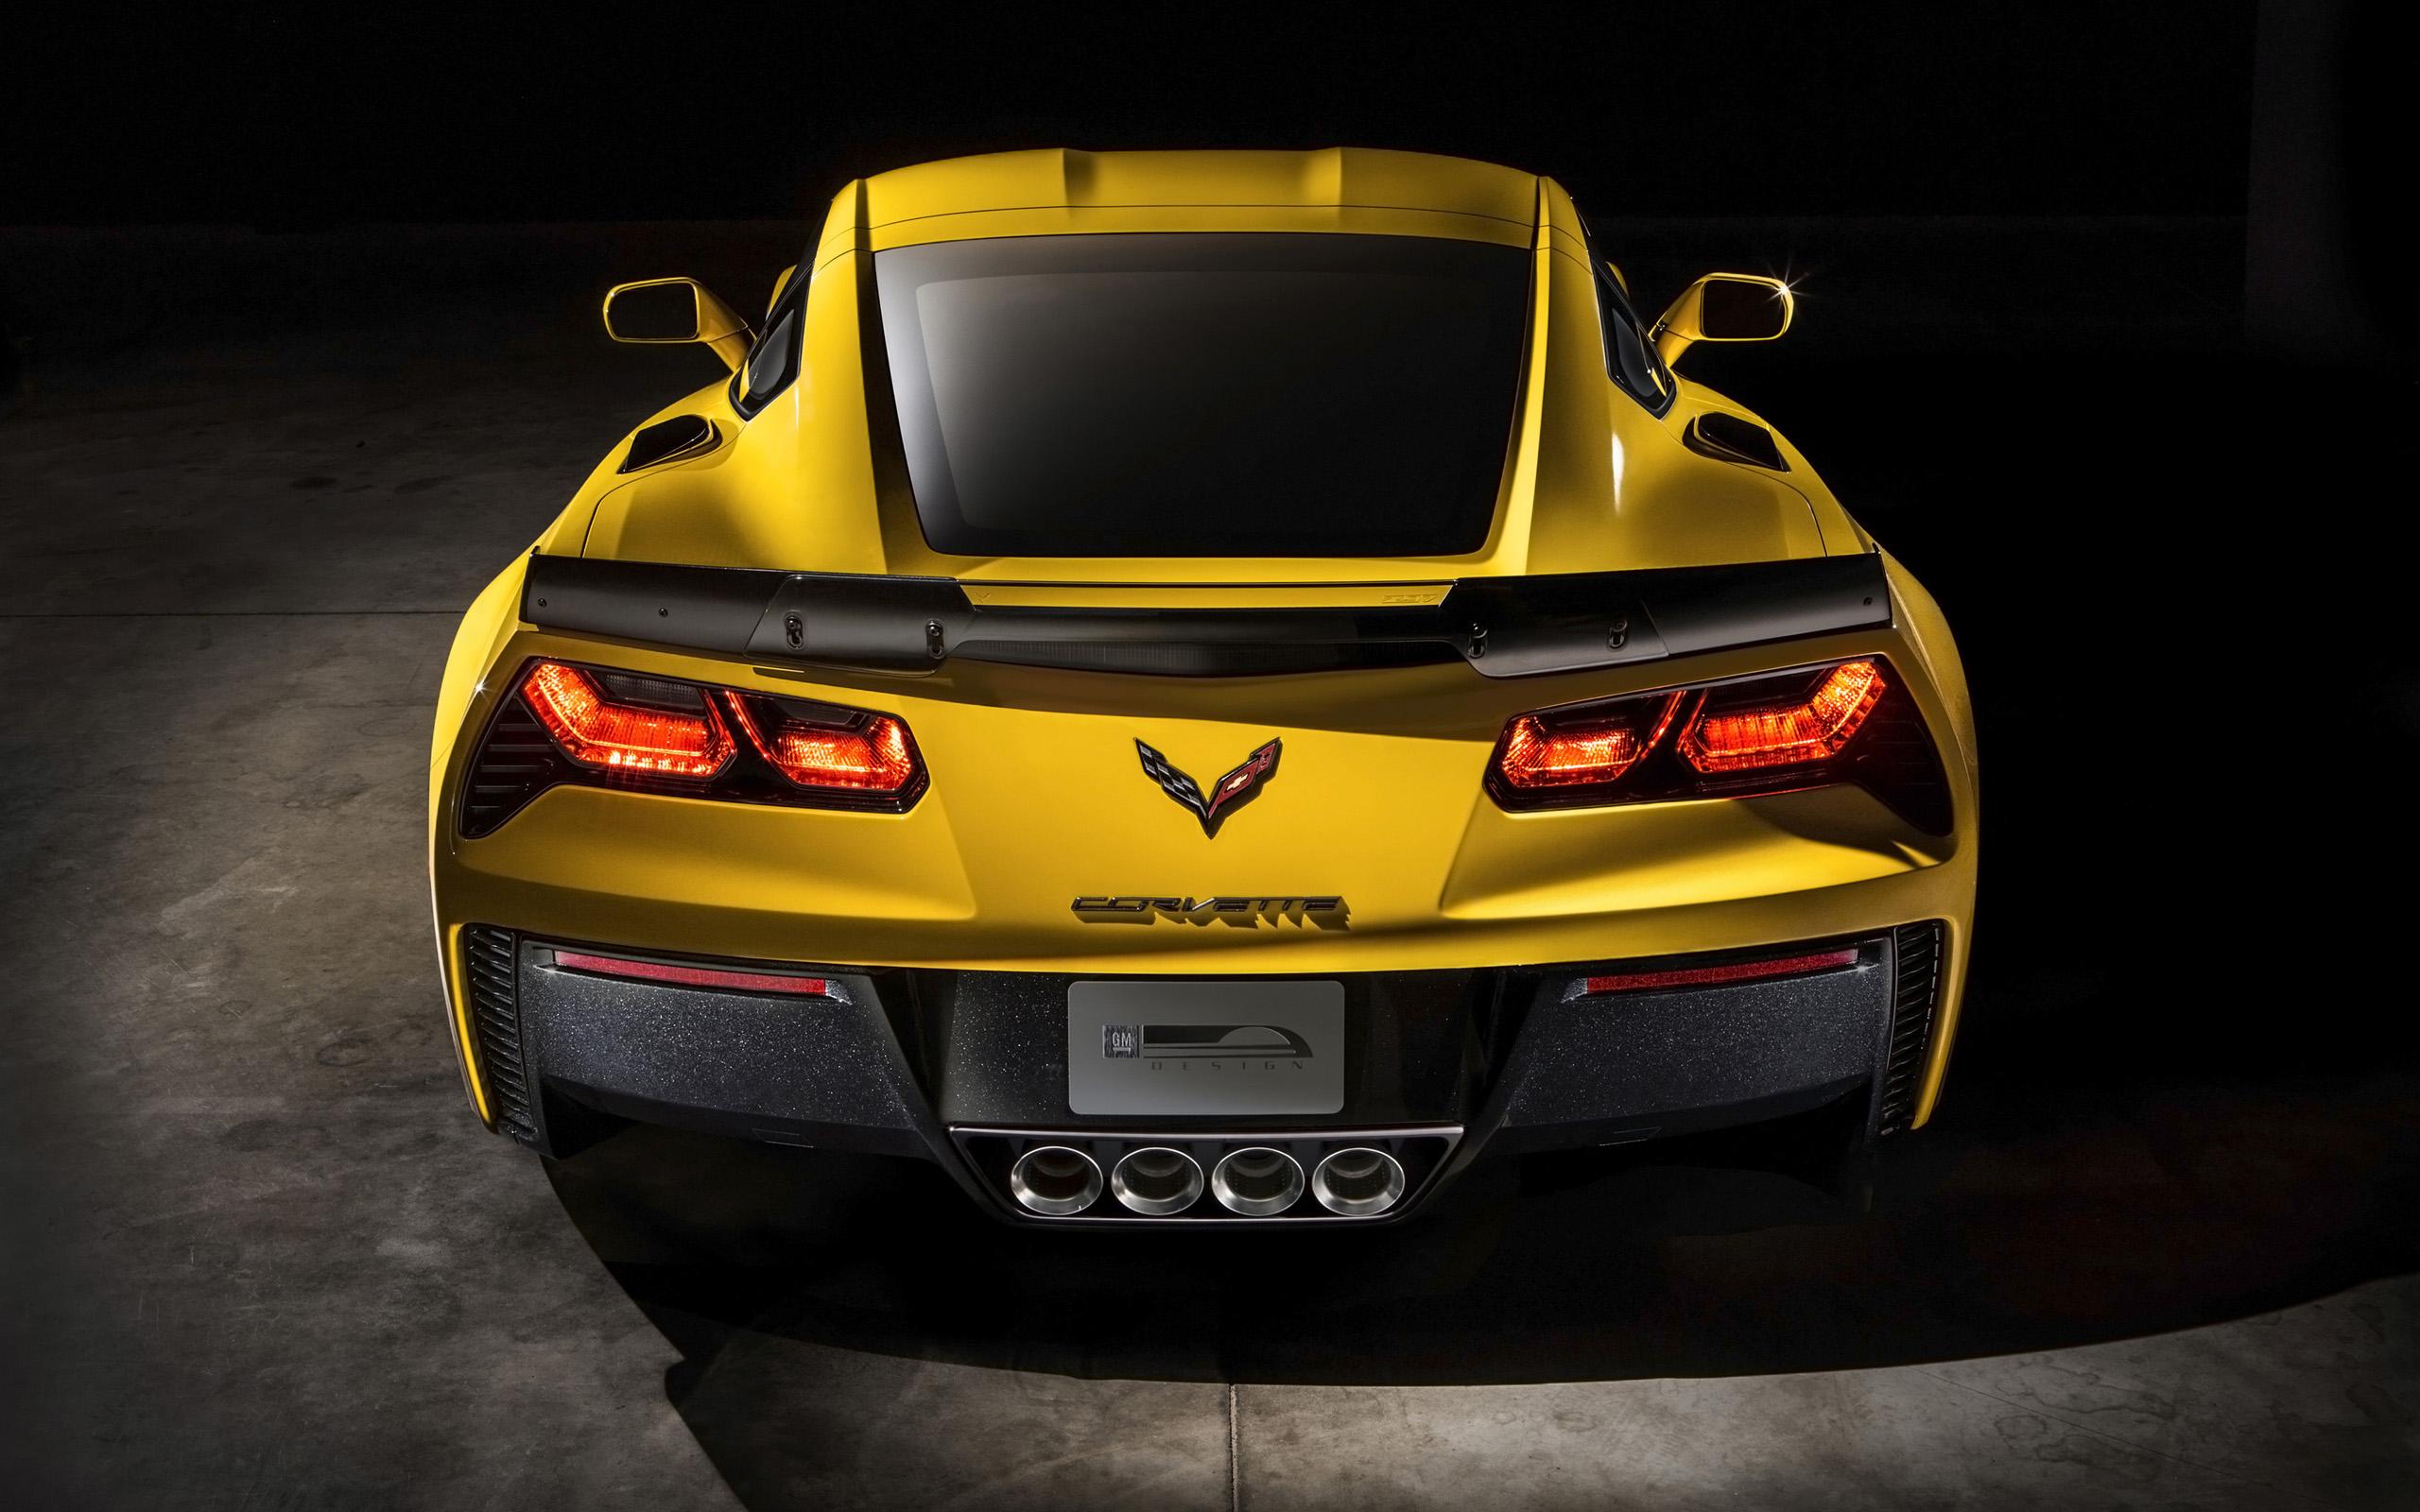 2015 chevrolet corvette z06 3 wallpaper hd car wallpapers. Black Bedroom Furniture Sets. Home Design Ideas